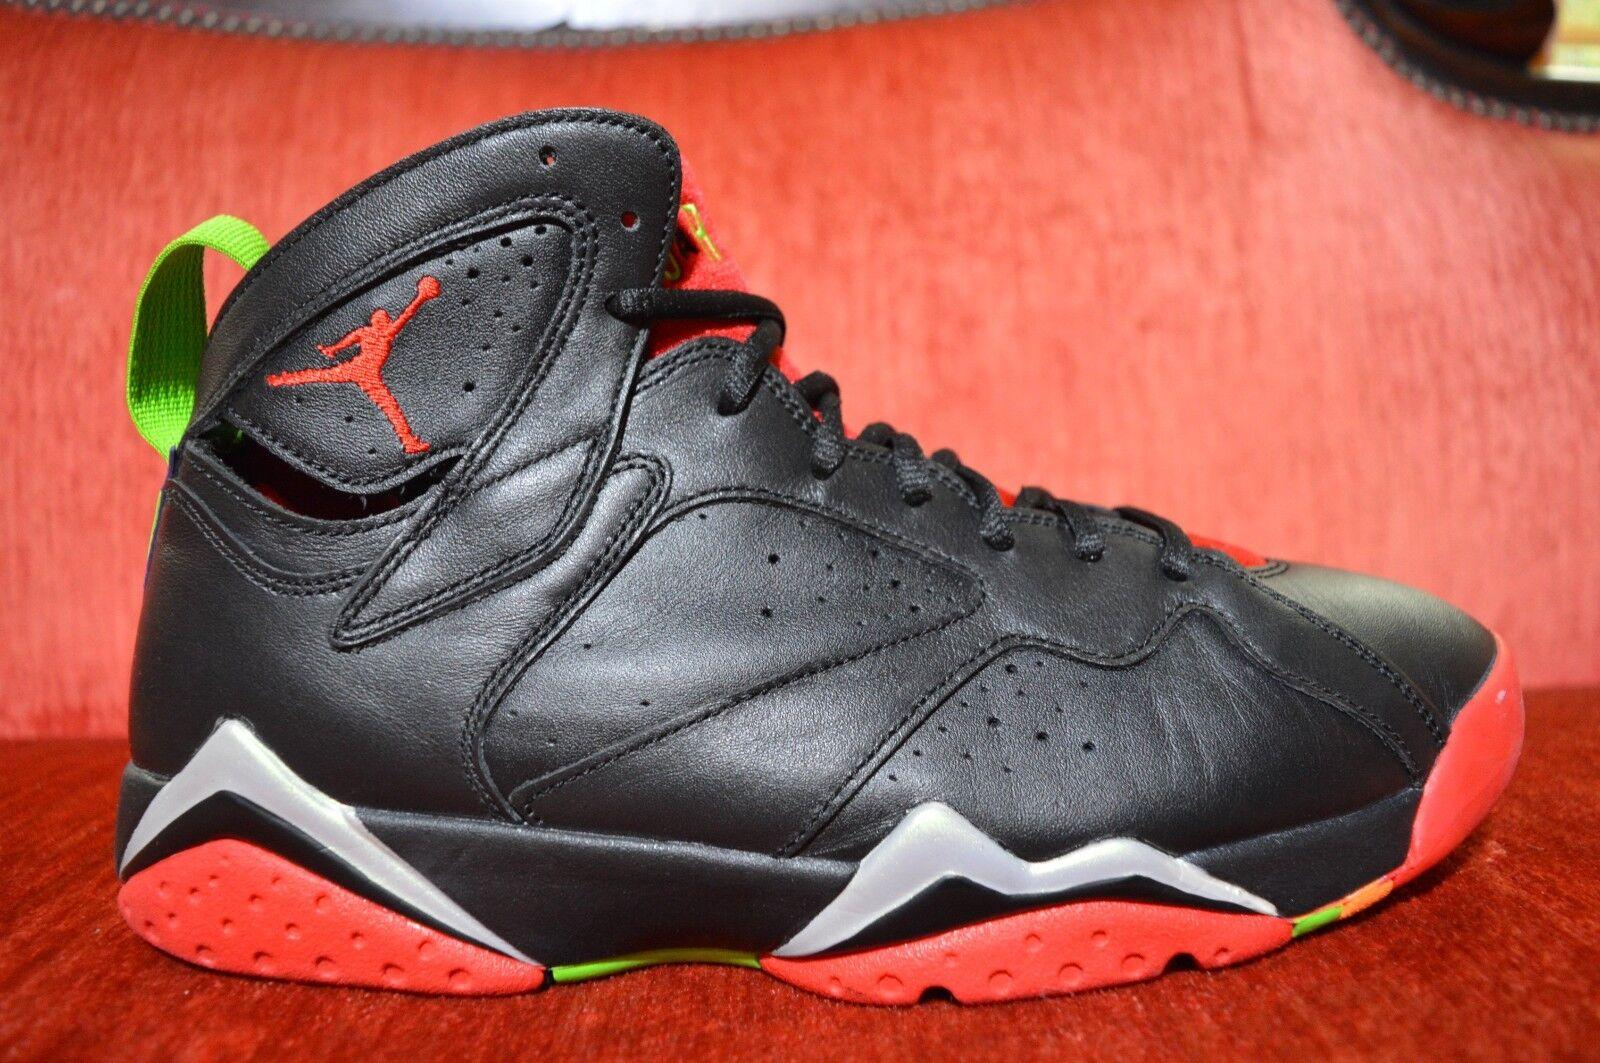 Limpiar Nike Air Jordan Retro Retro Jordan 7 VII comodo gran descuento 99e5e2